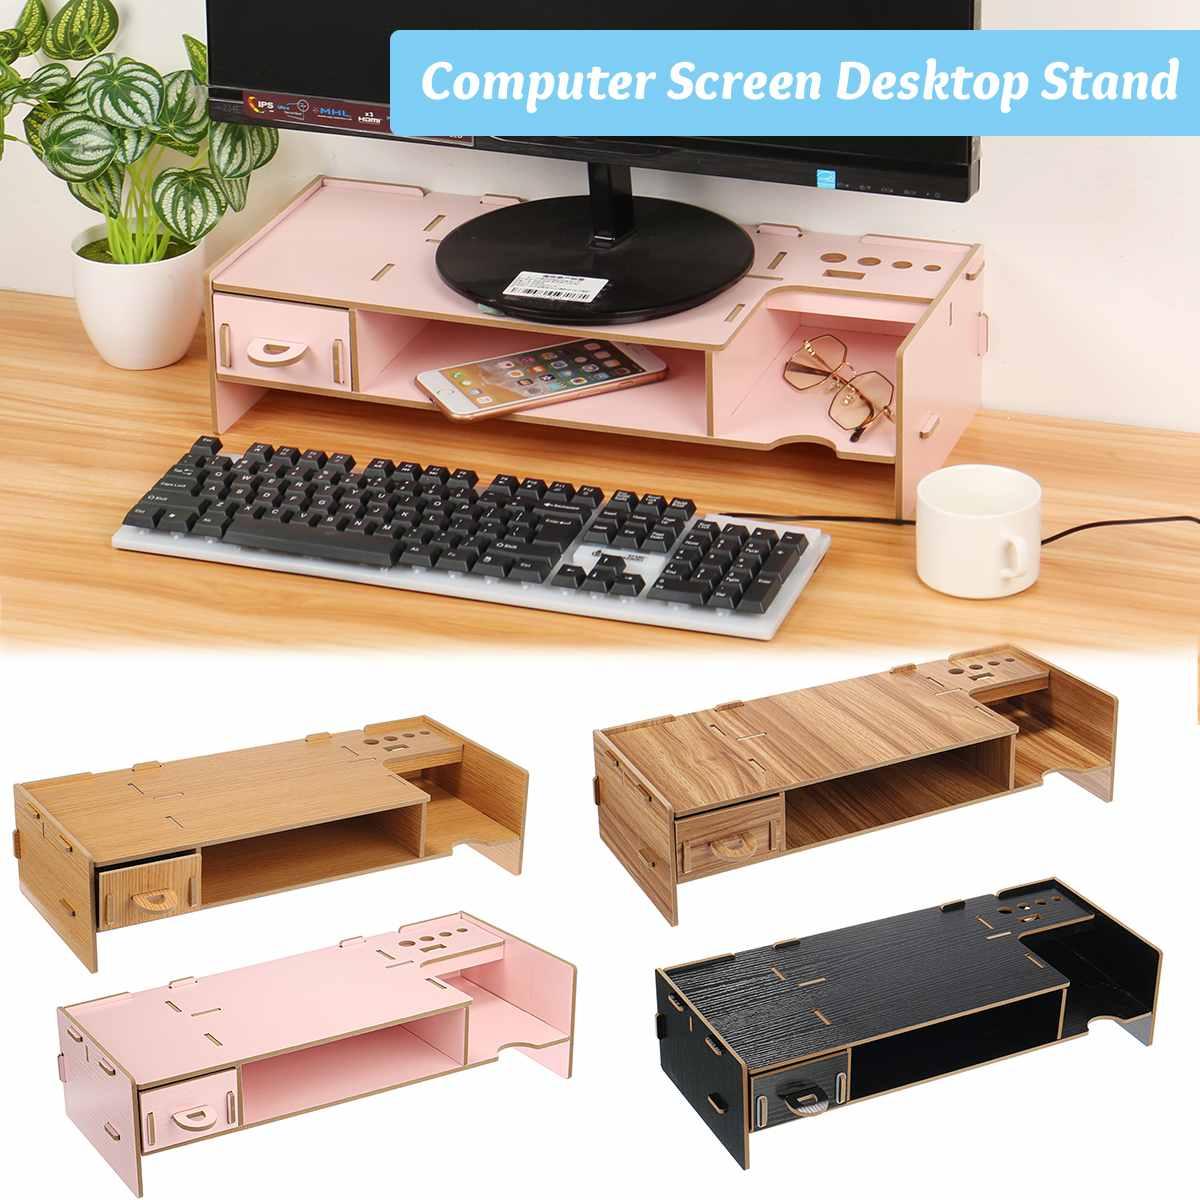 Computer Screen Riser Wood Shelf Plinth Strong Laptop Stand Multi-function Desktop Monitor Stand Desk Holder For Notebook TV